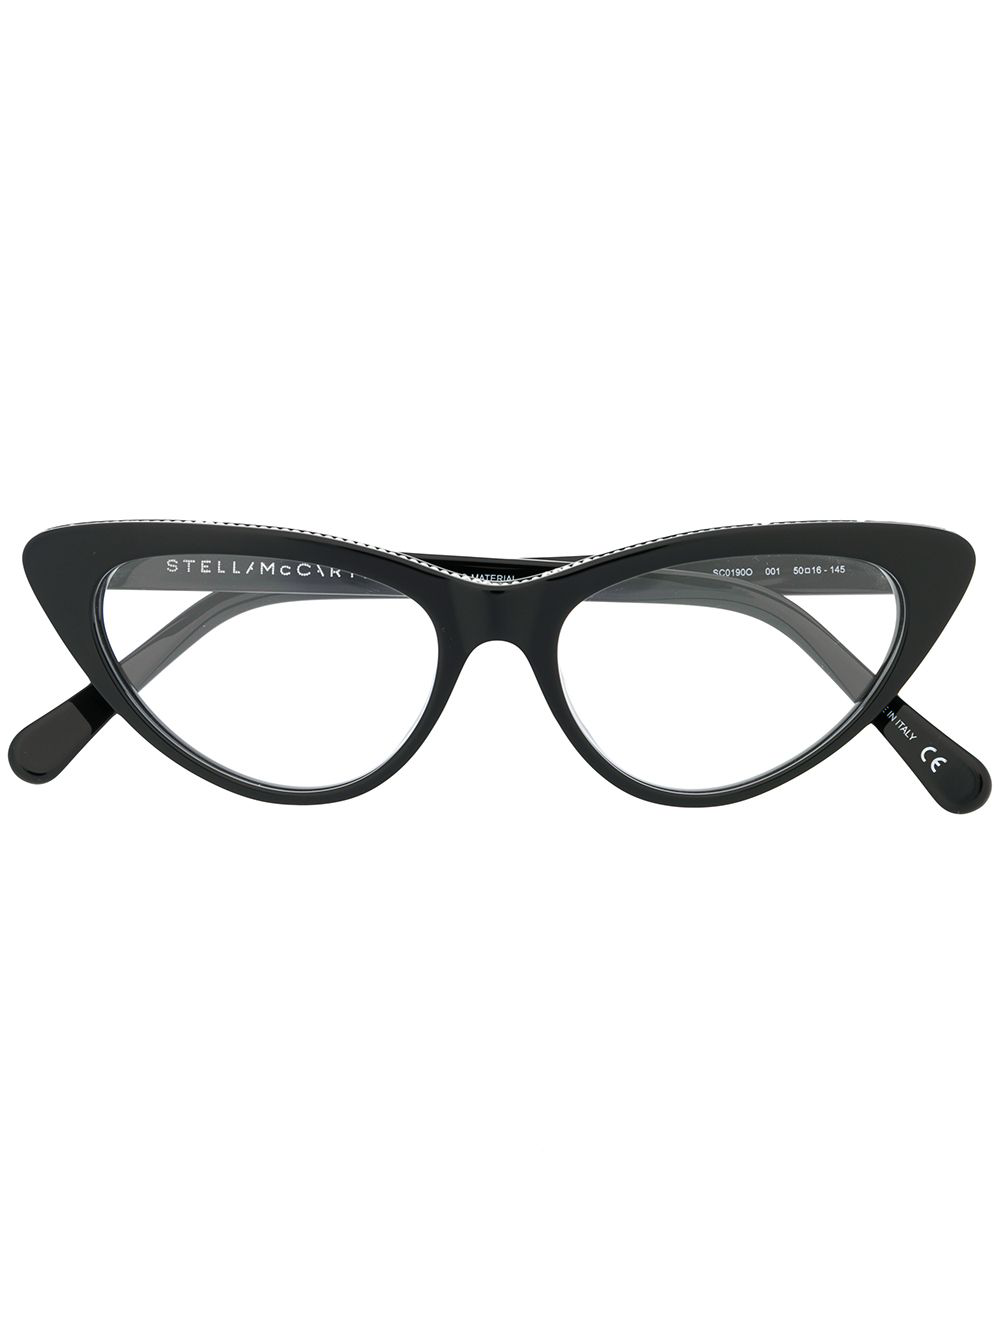 eac200d7e32f6 Stella Mccartney Eyewear Cat Eye Frame Glasses - Black